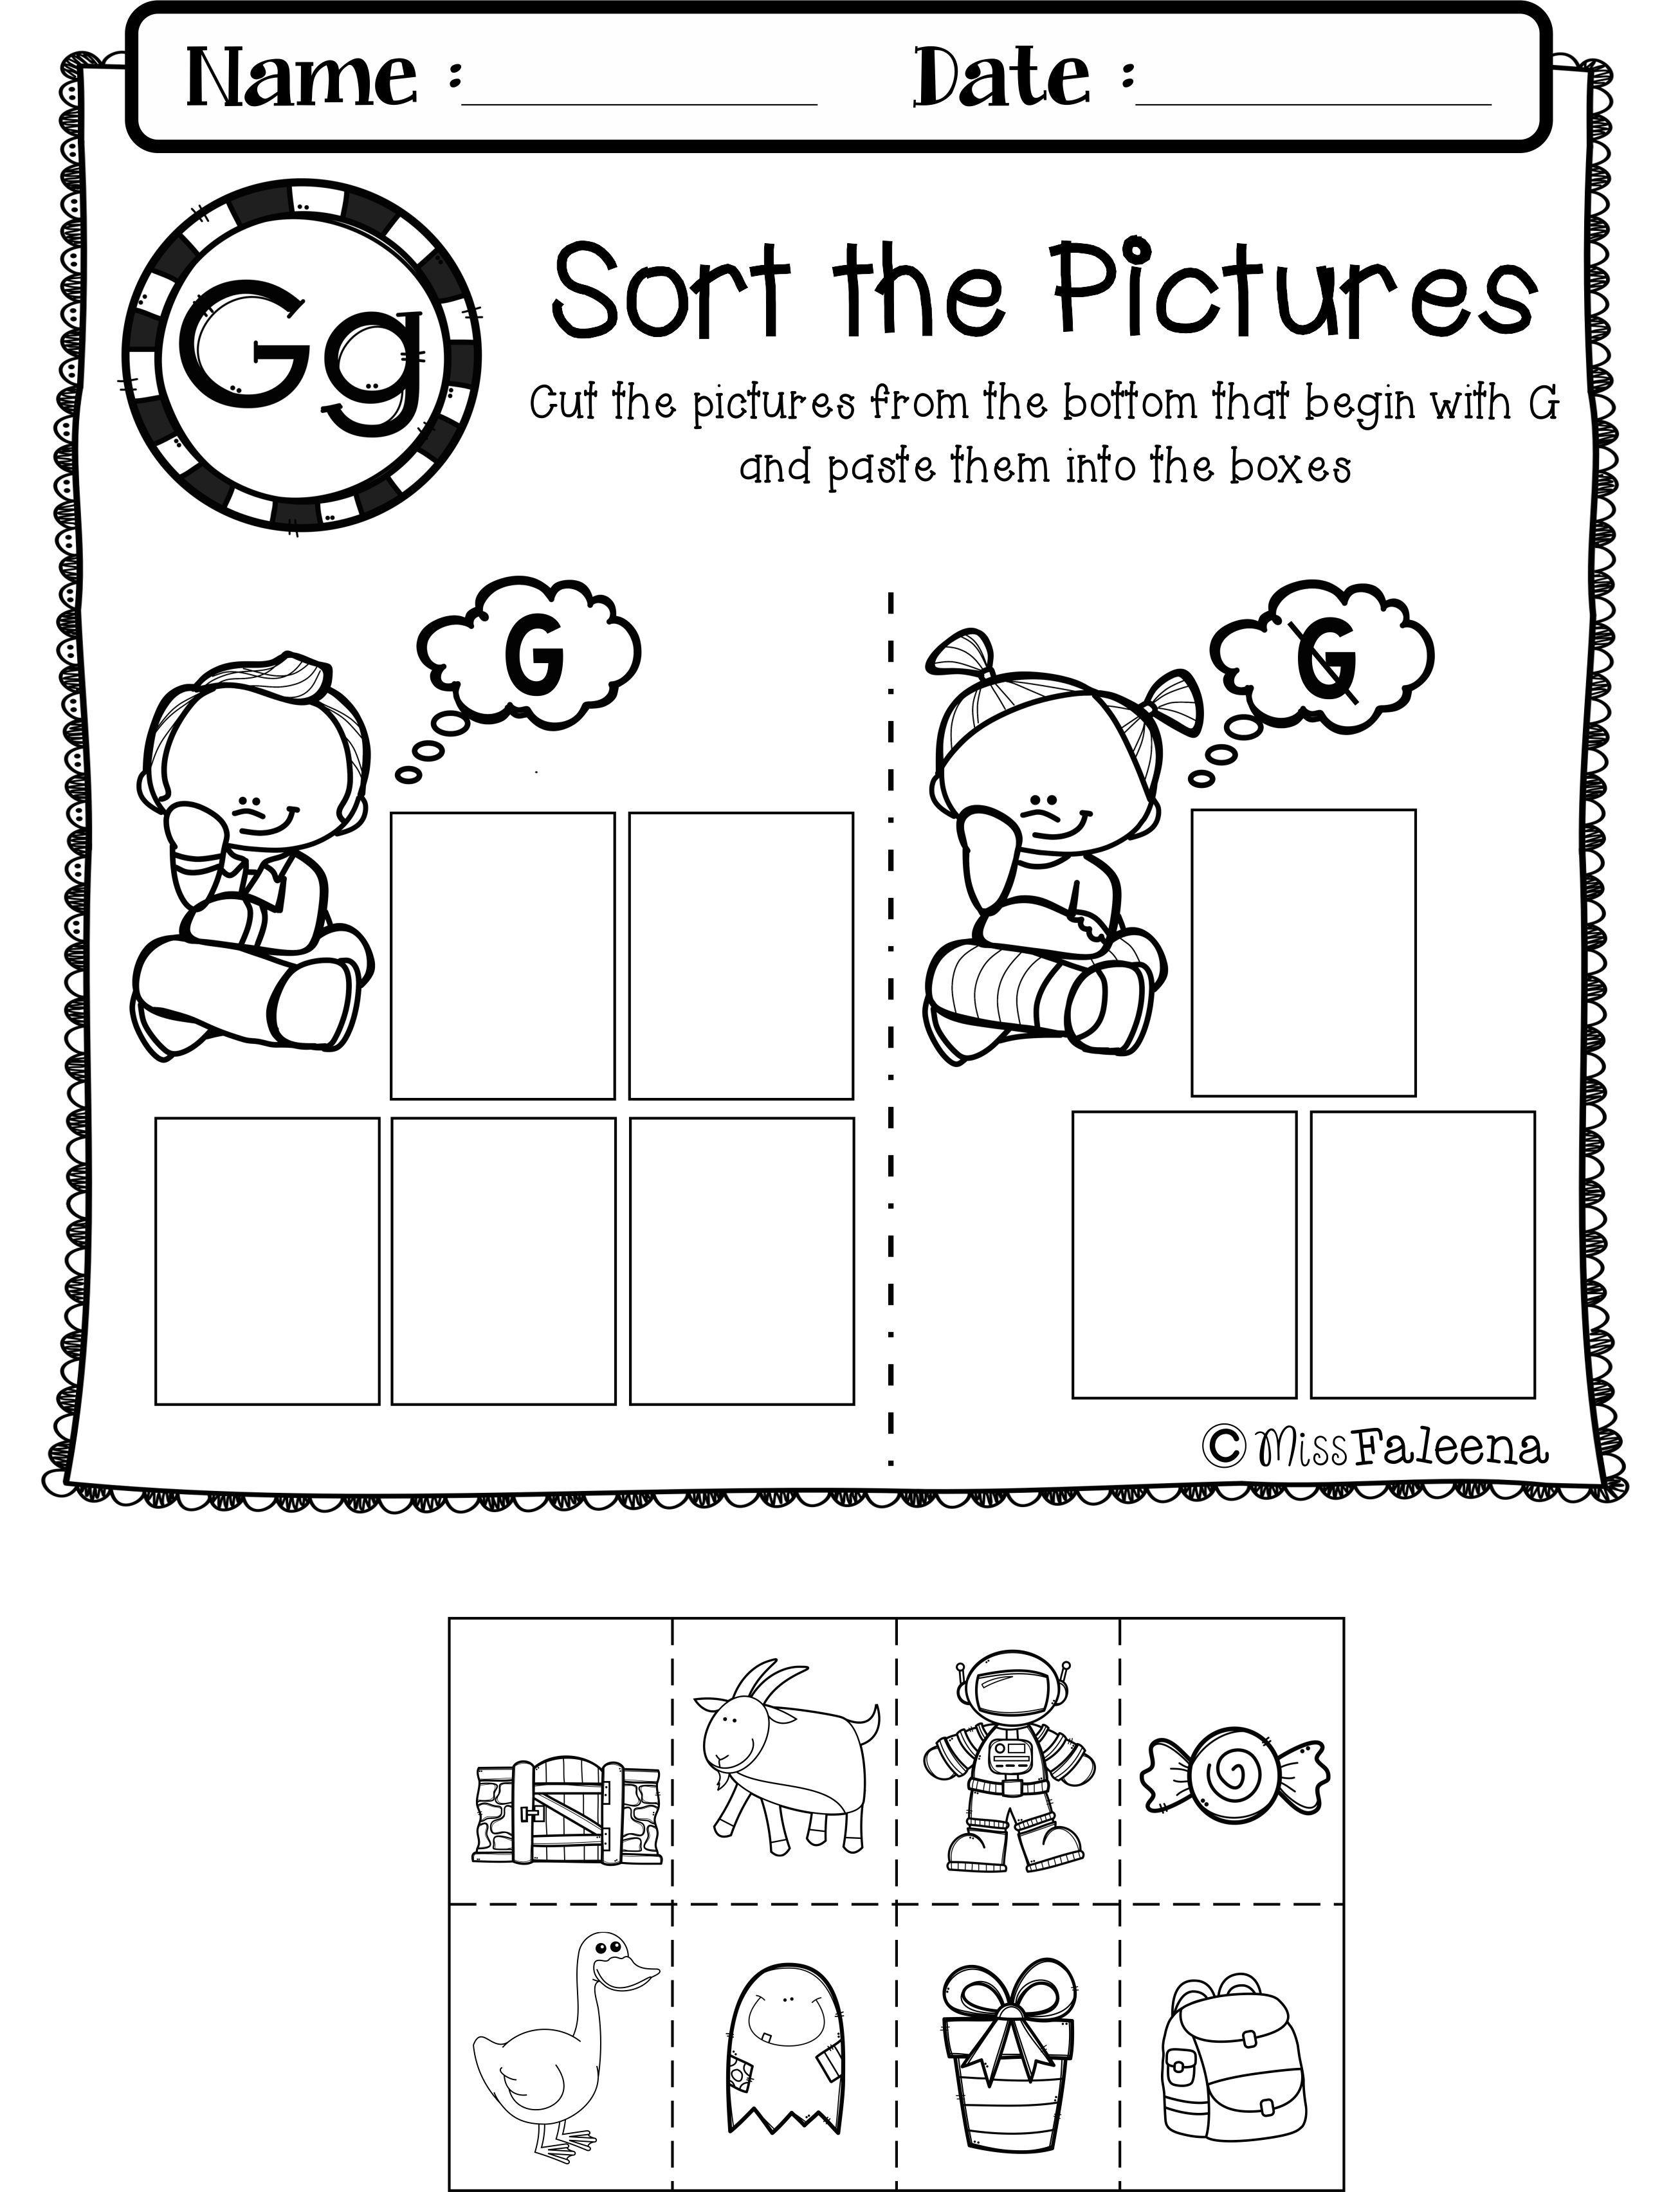 Alphabet Letter Of The Week A To Z The Bundle Kindergarten Lesson Plans Teacher Help Special Education Elementary [ 3408 x 2612 Pixel ]